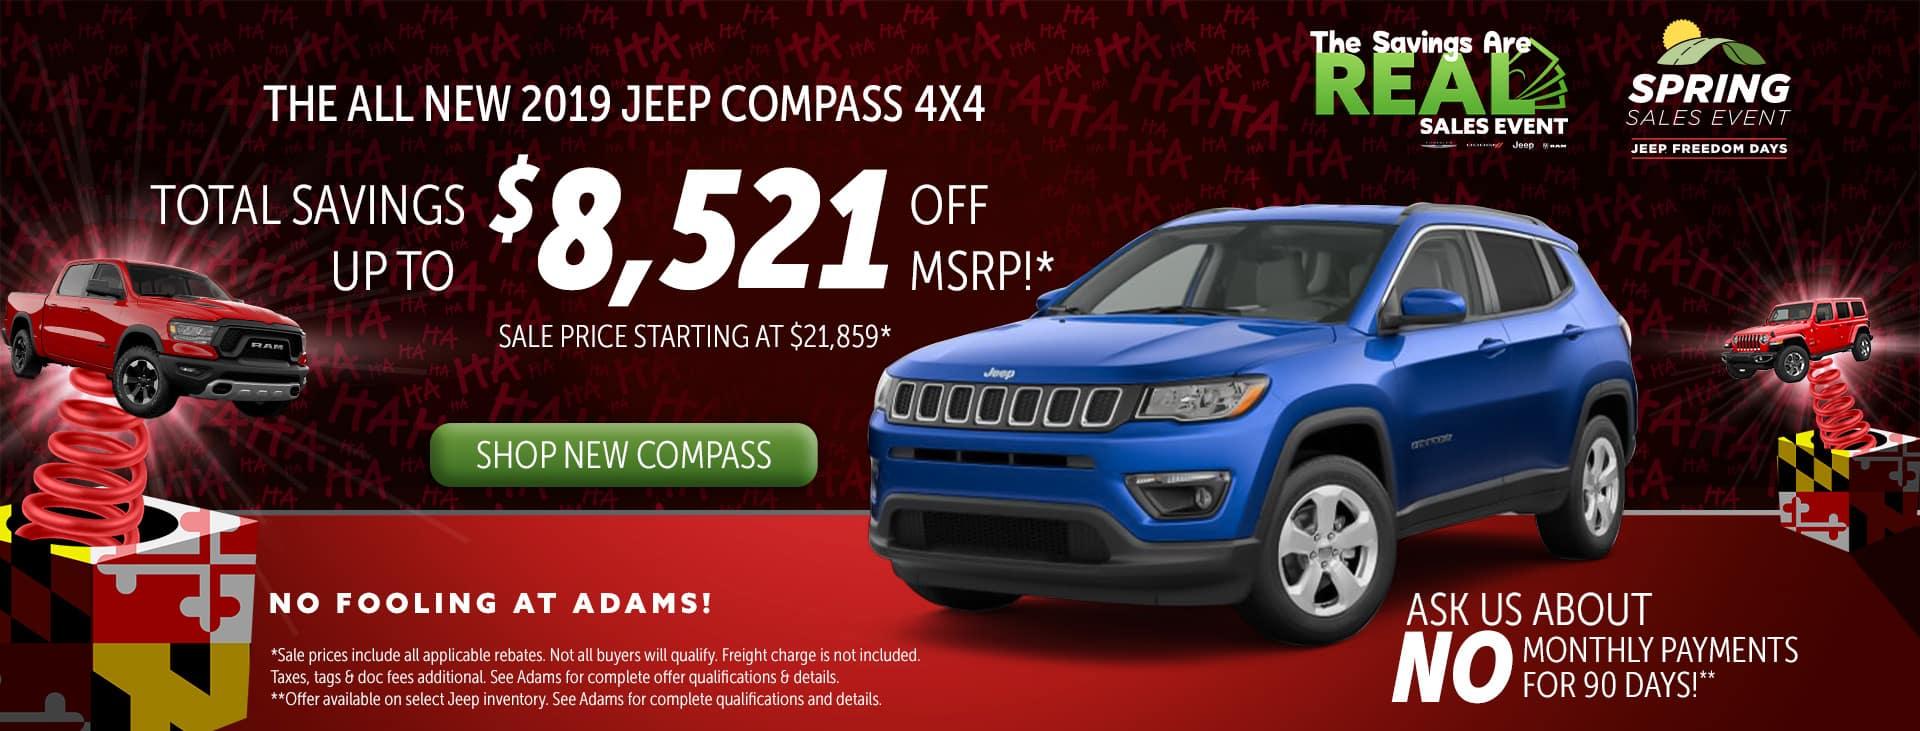 huge savings on jeep compass!